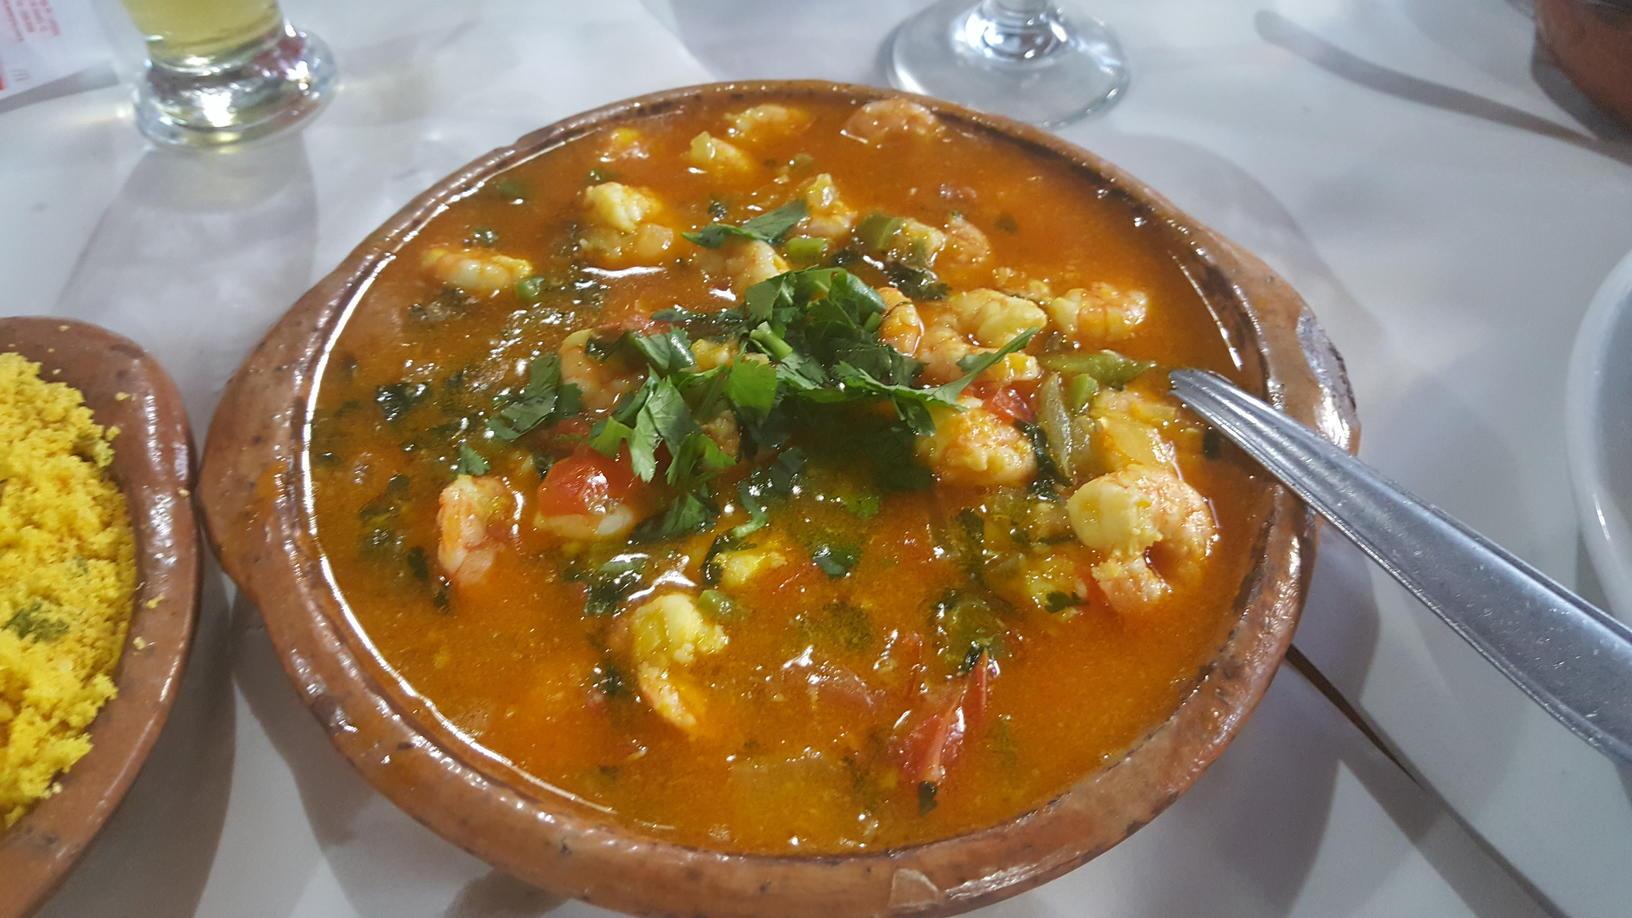 Michael S Novilla enjoys the Eat Rio Food Tour with Tom Le Mesurier